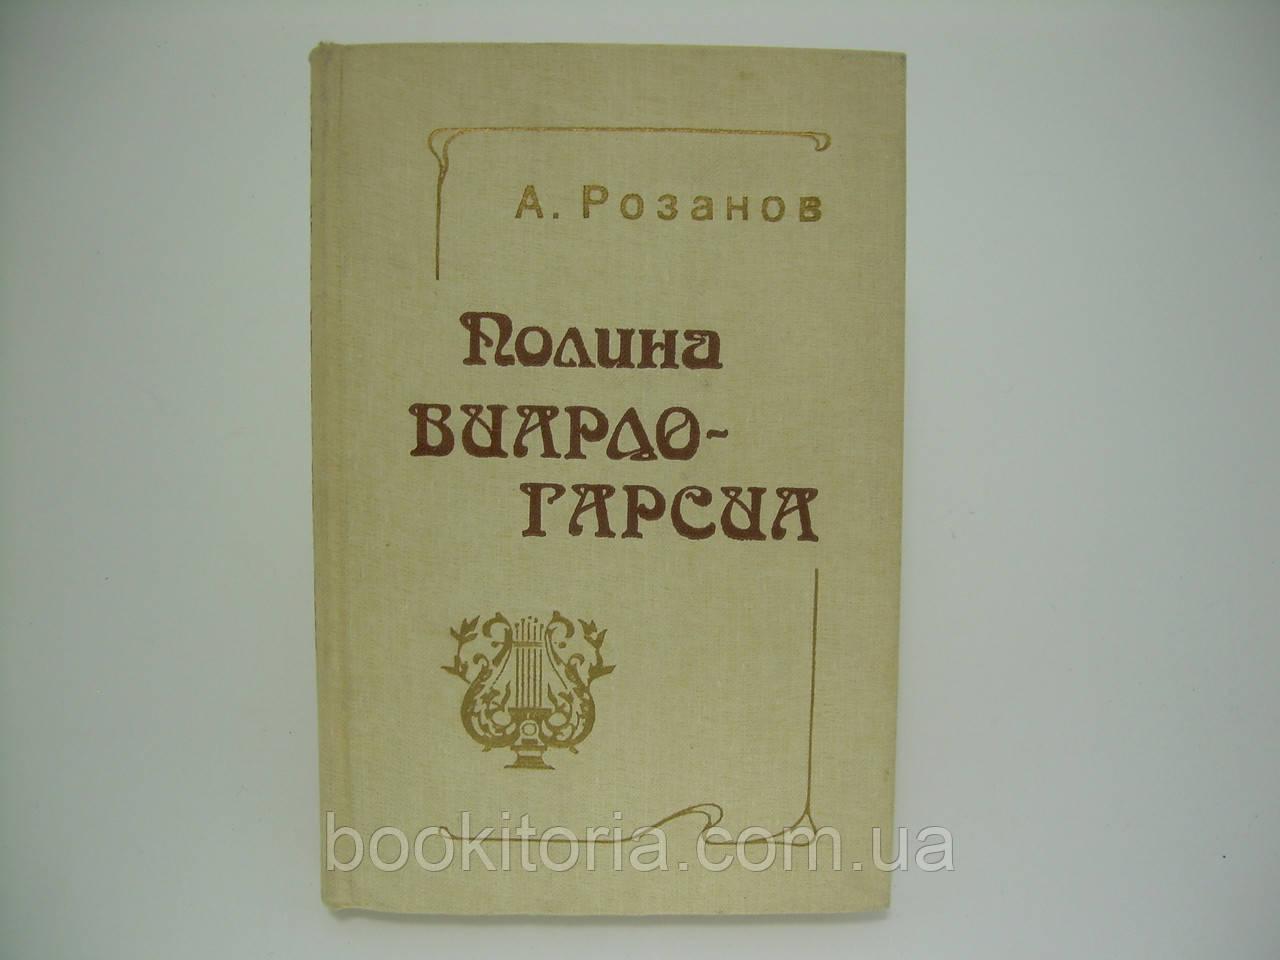 Розанов А. Полина Виардо-Гарсиа (б/у).